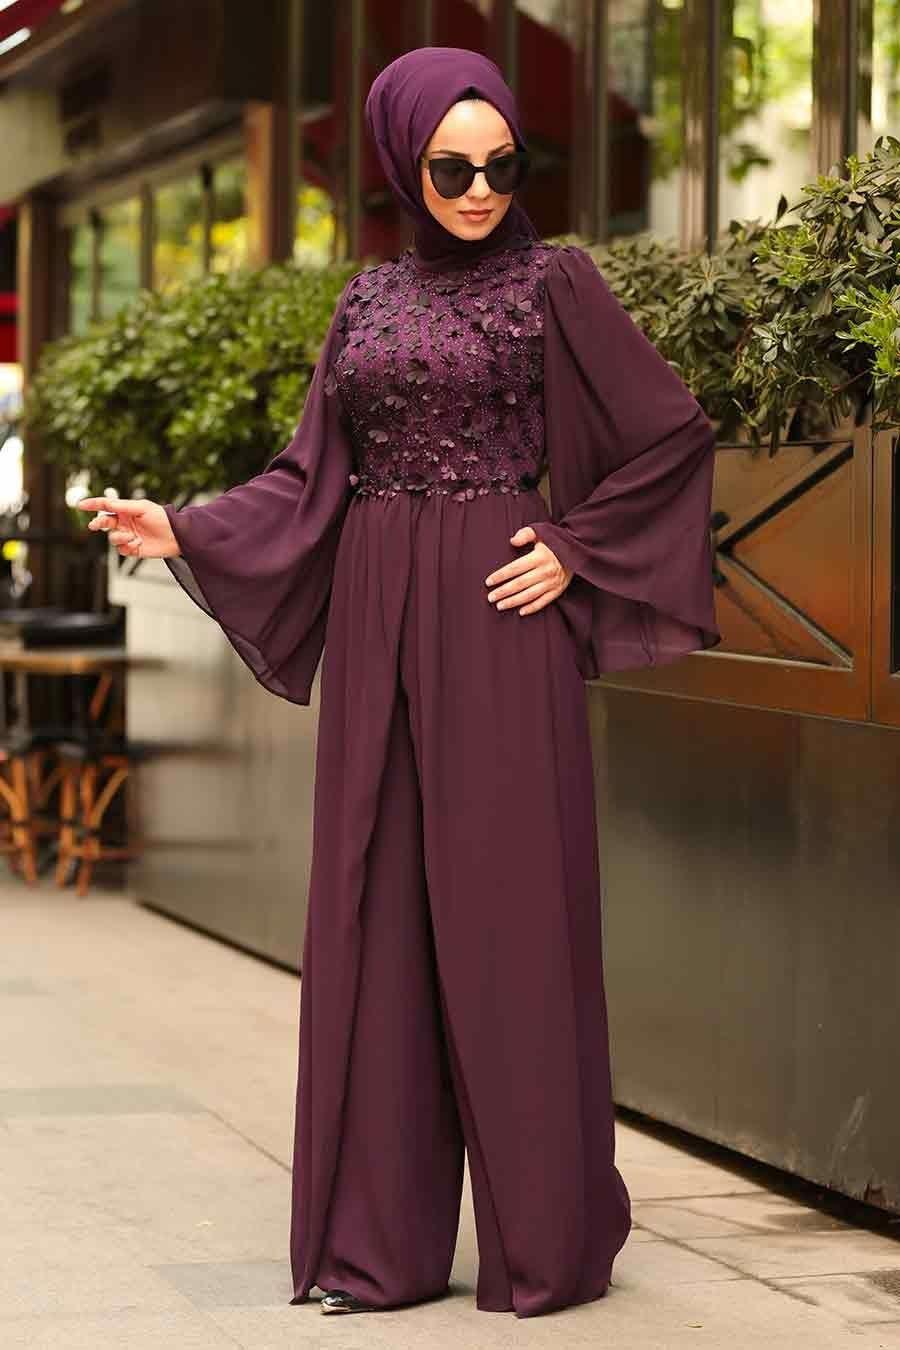 Nayla Collection Uc Boyutlu Cicekli Mor Tesettur Abiye Tulum 3932mor Tesetturisland Com Tesettur Abiye Modelleri 2020 Hijab Fashion Fashion Daily Dress